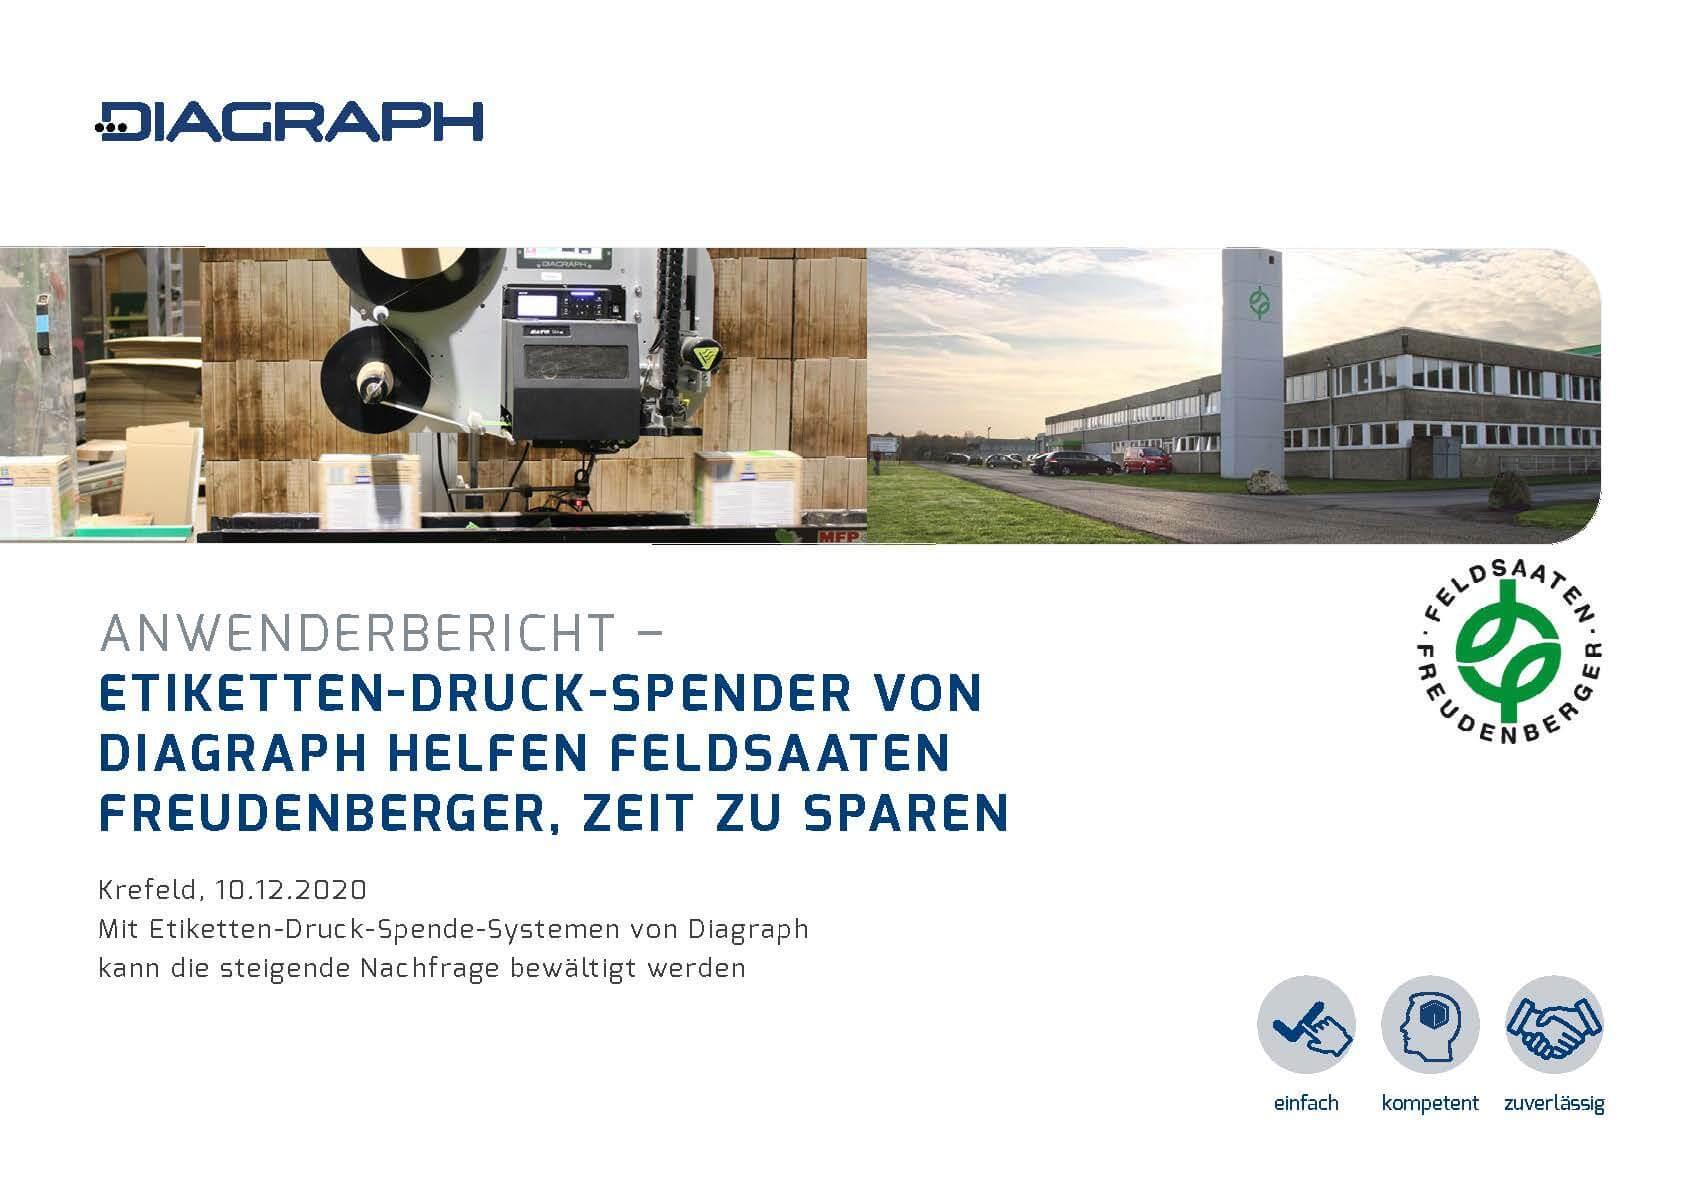 Anwenderberichte-2021-06-16-14-00-Feldsaaten_Freudenberger-WEB_Seite_1